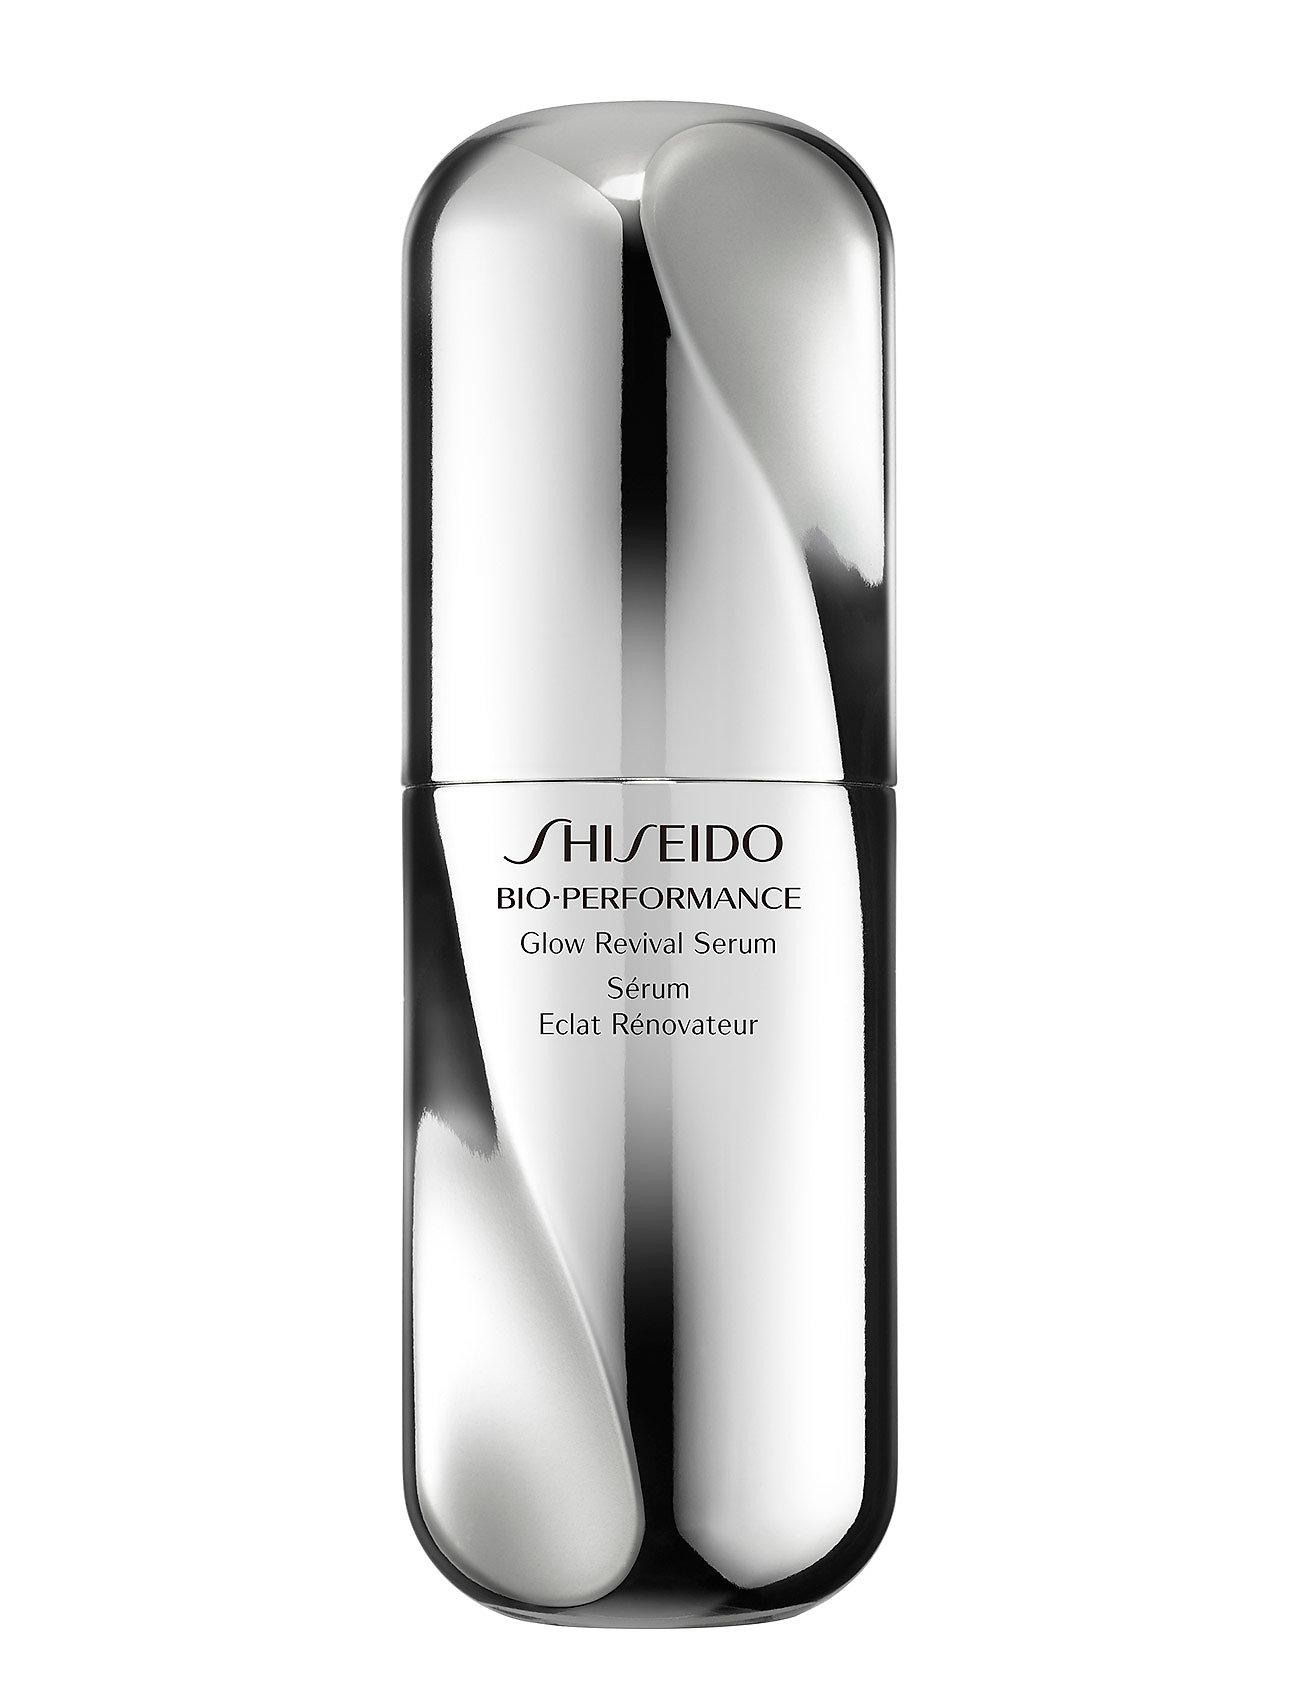 Image of Bio-Performance Glow Revival Serum Serum Ansigtspleje Nude SHISEIDO (2873475093)